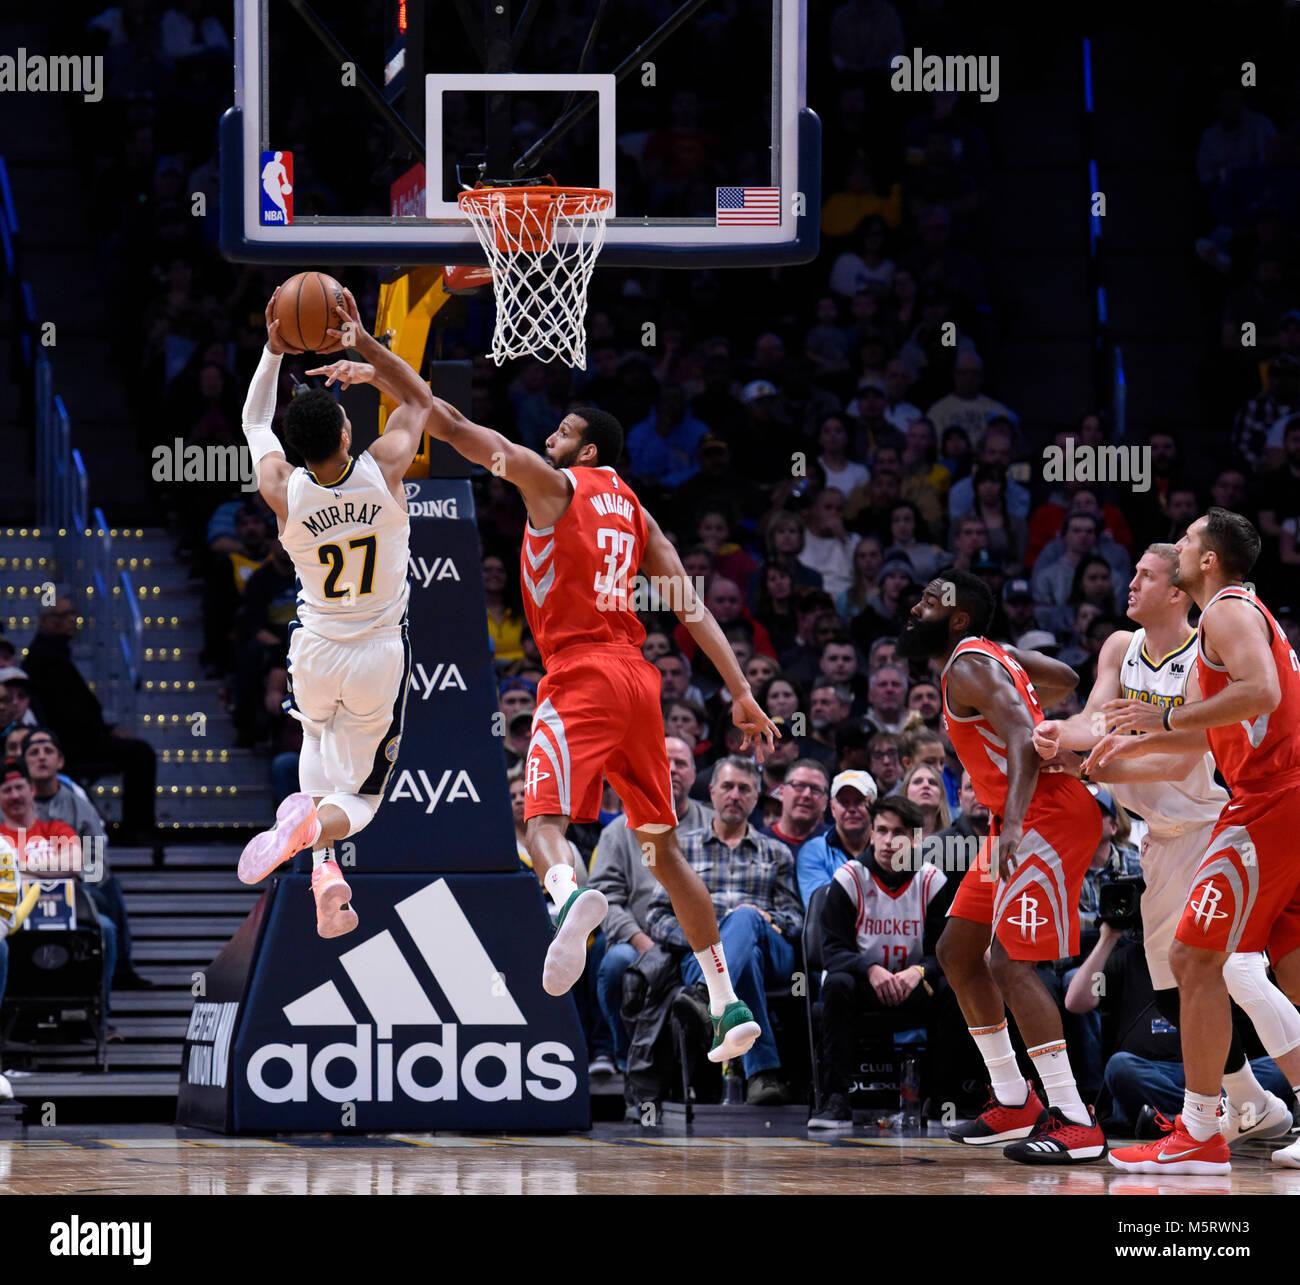 Denver Nuggets Guards: James Harden Stock Photos & James Harden Stock Images